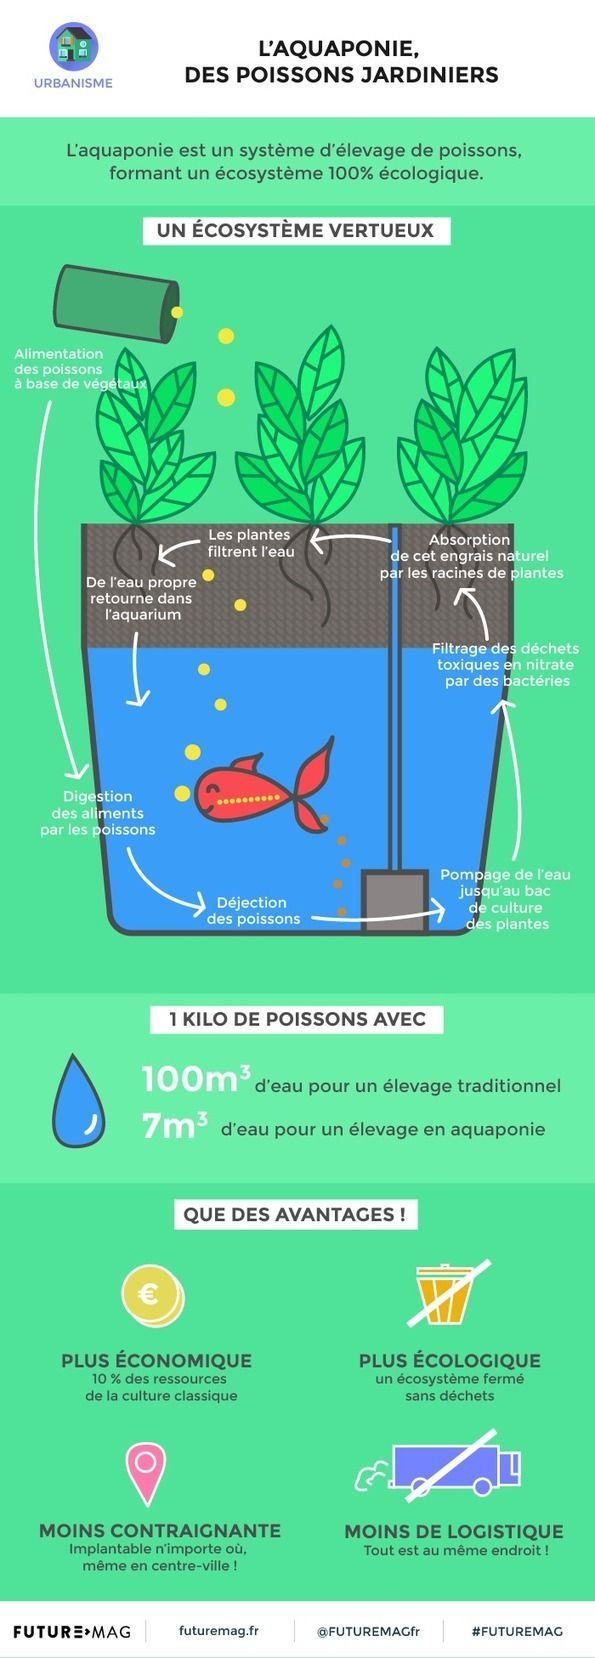 L'aquaponie, des poissons jardiniers